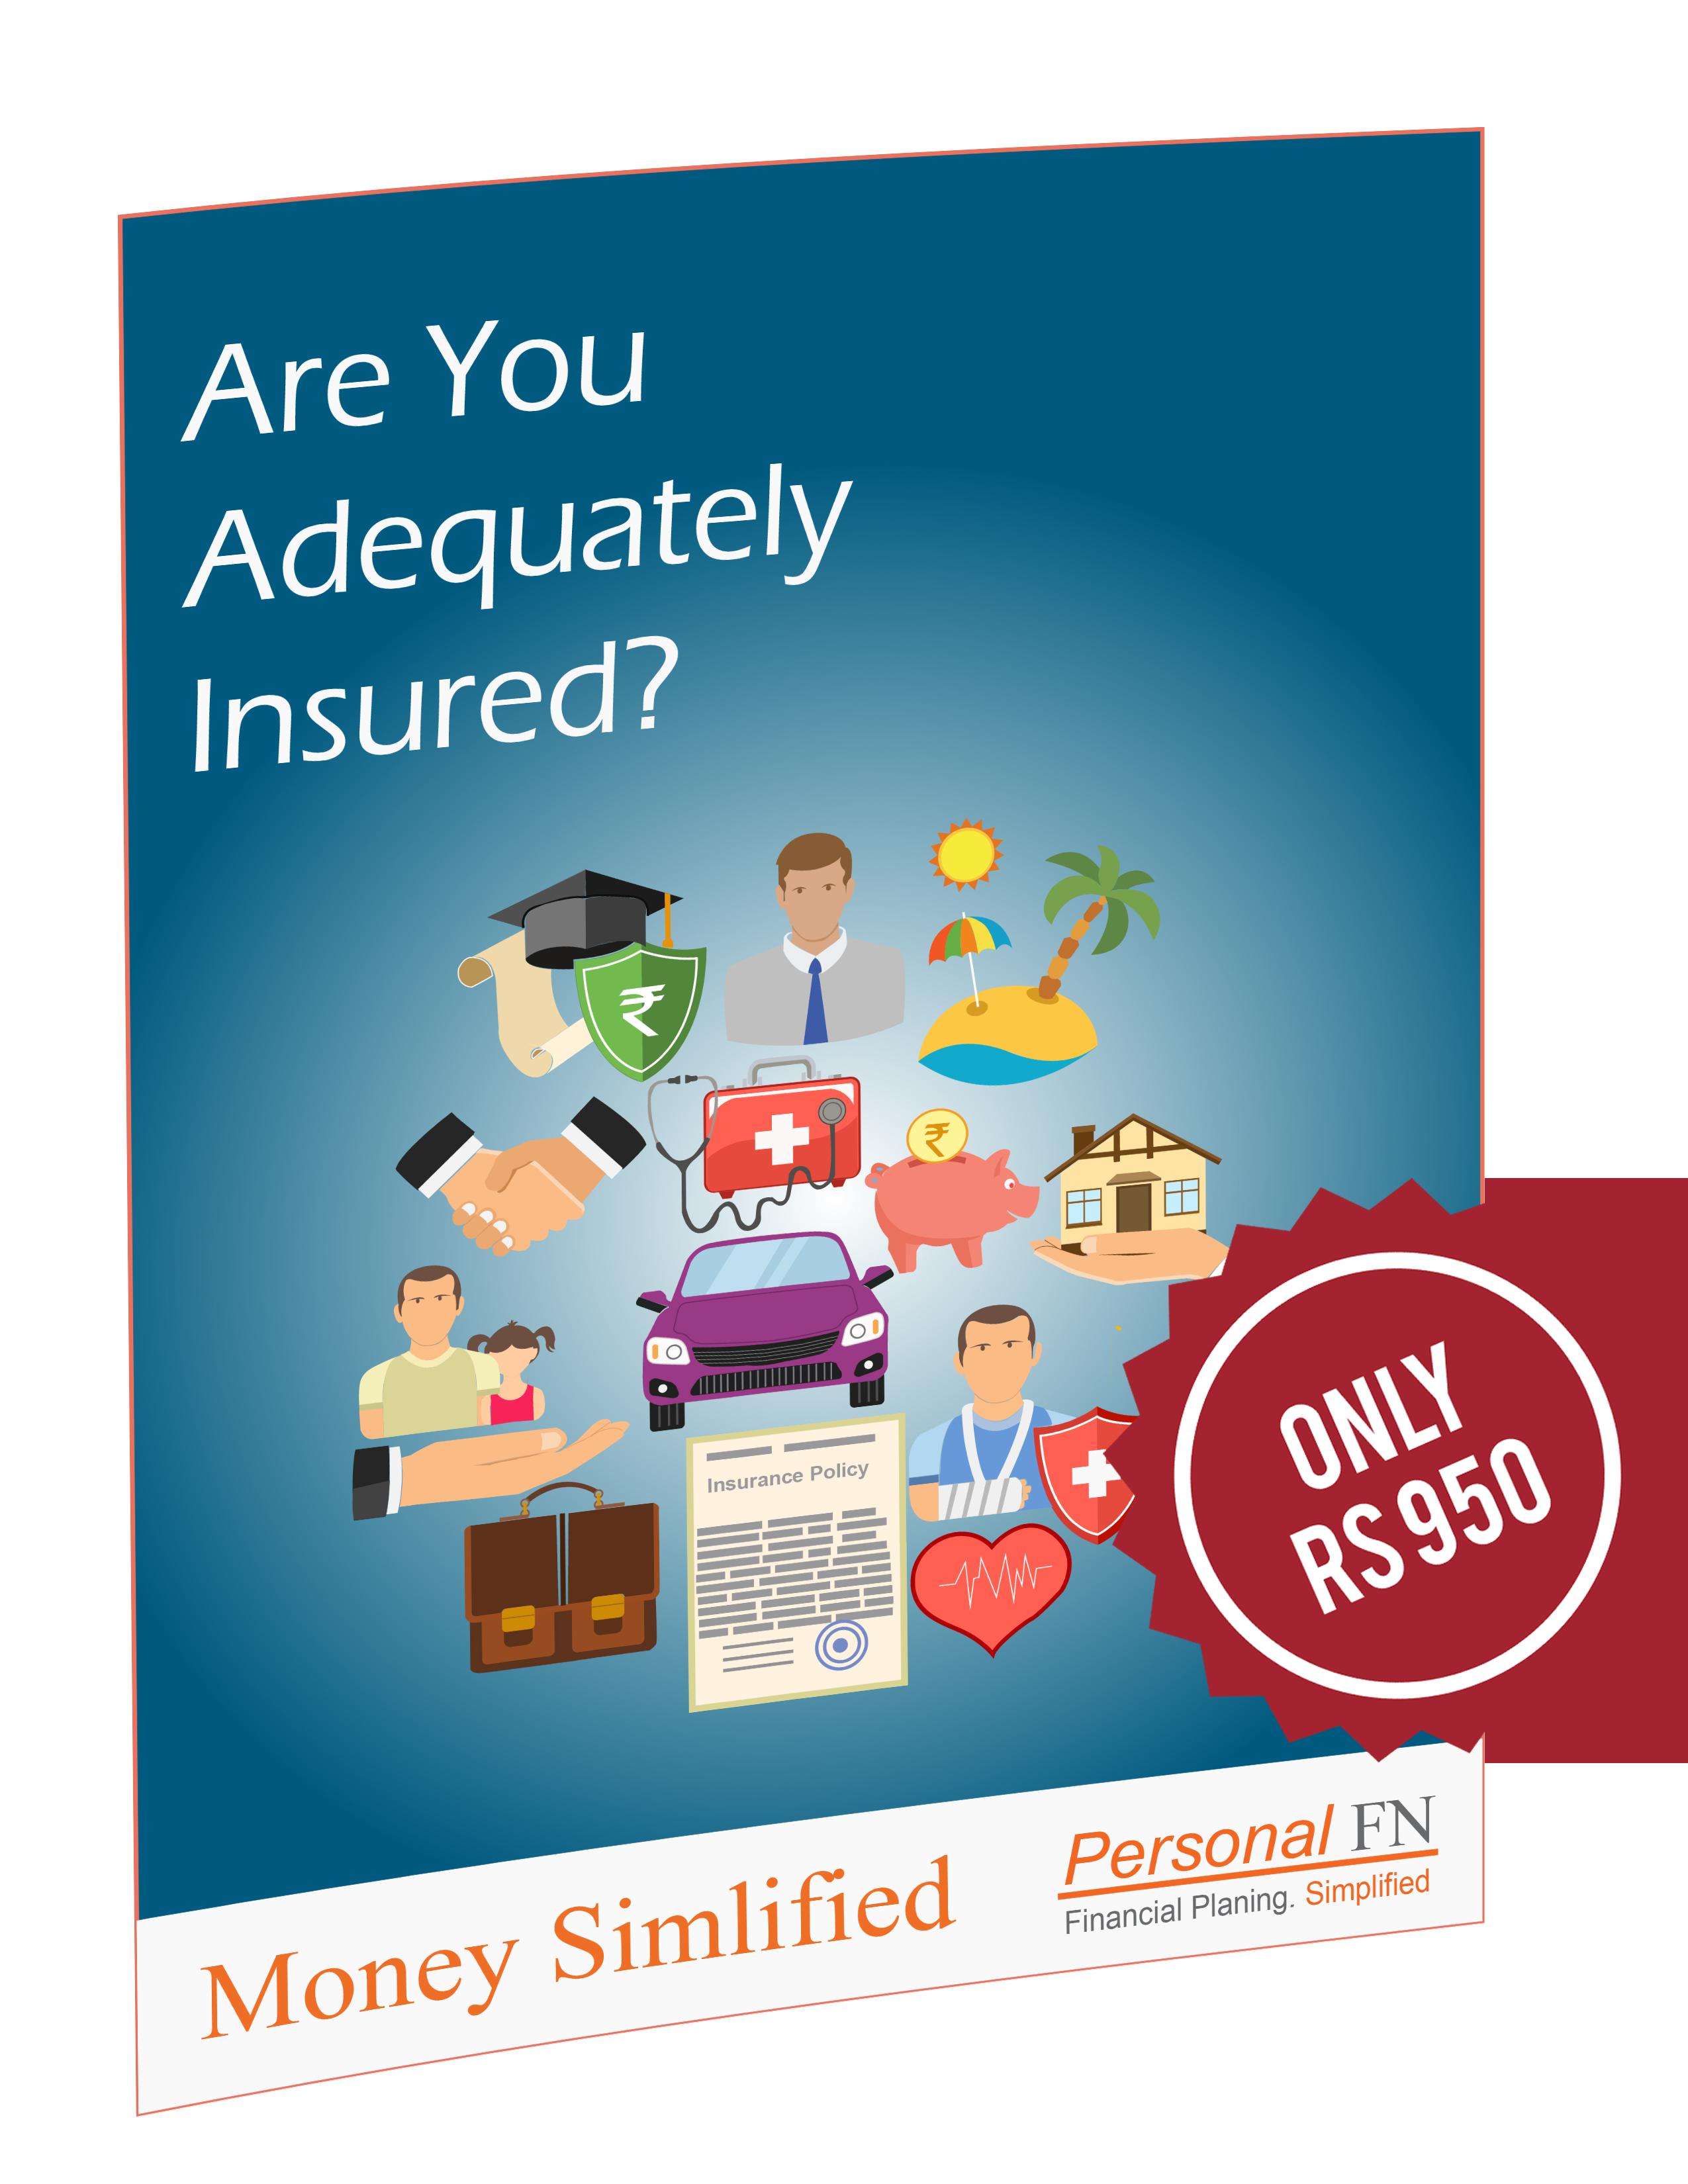 Are You Adequately Insured